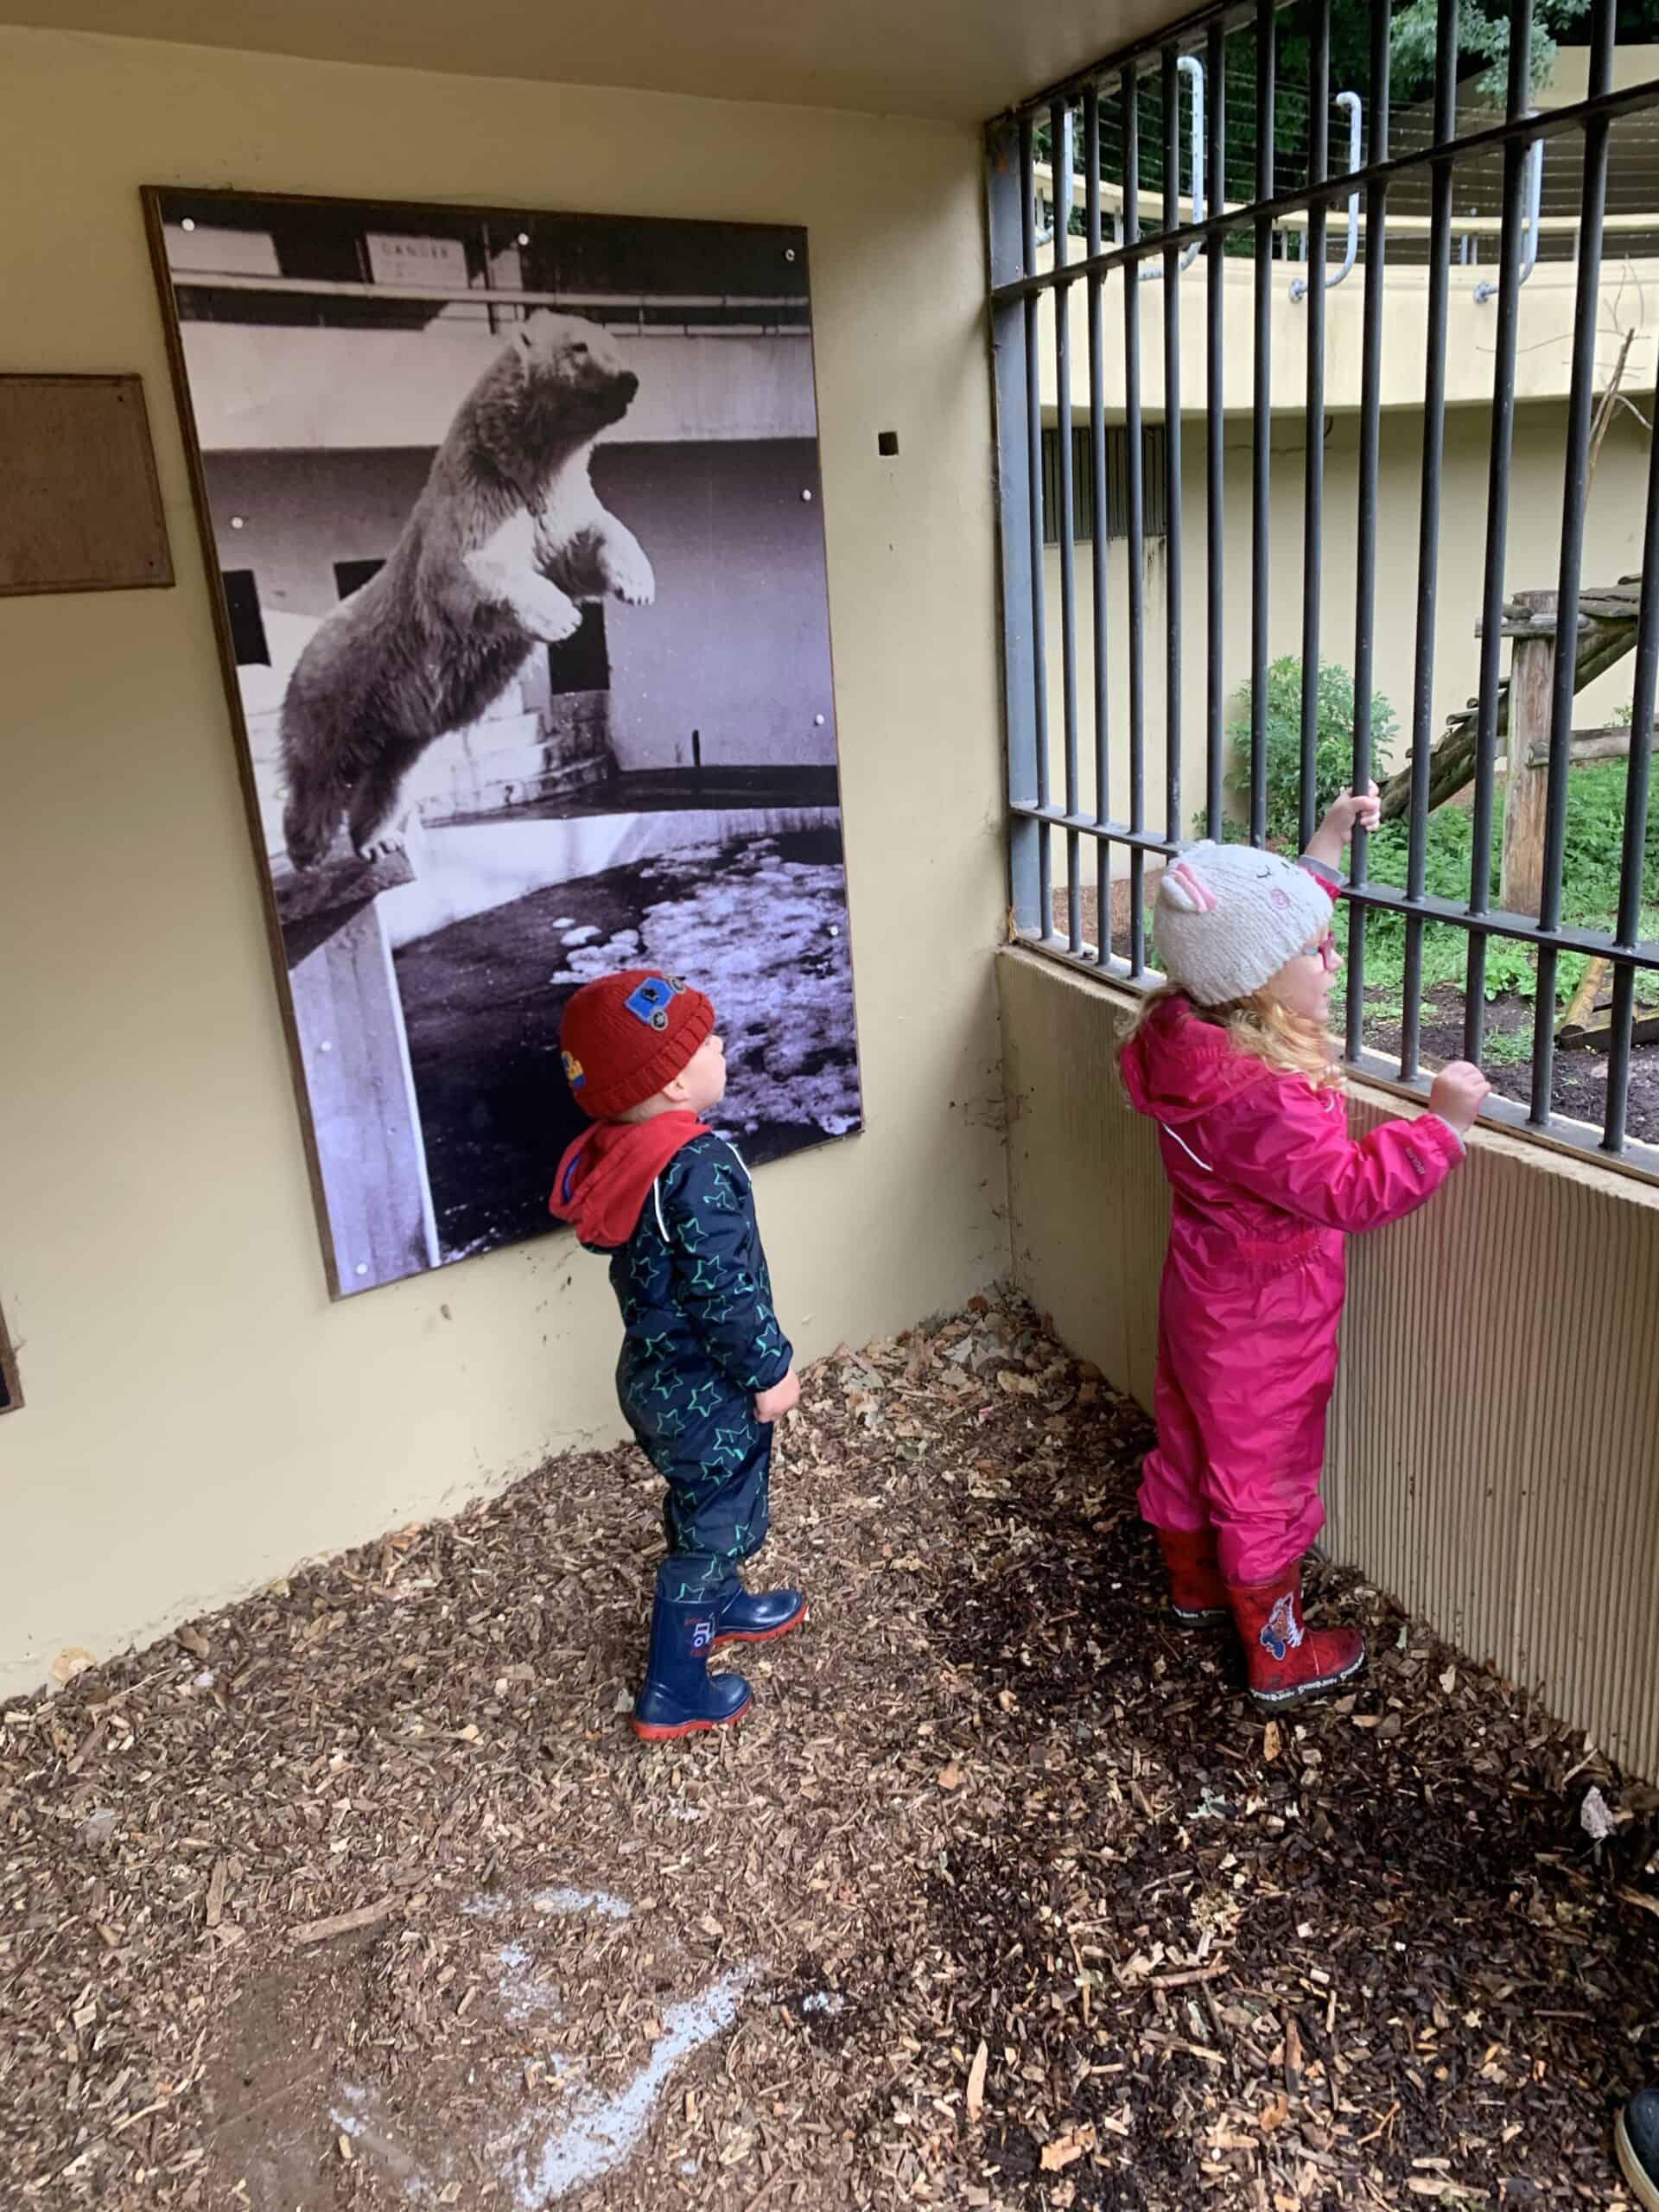 Exploring Dudley zoo